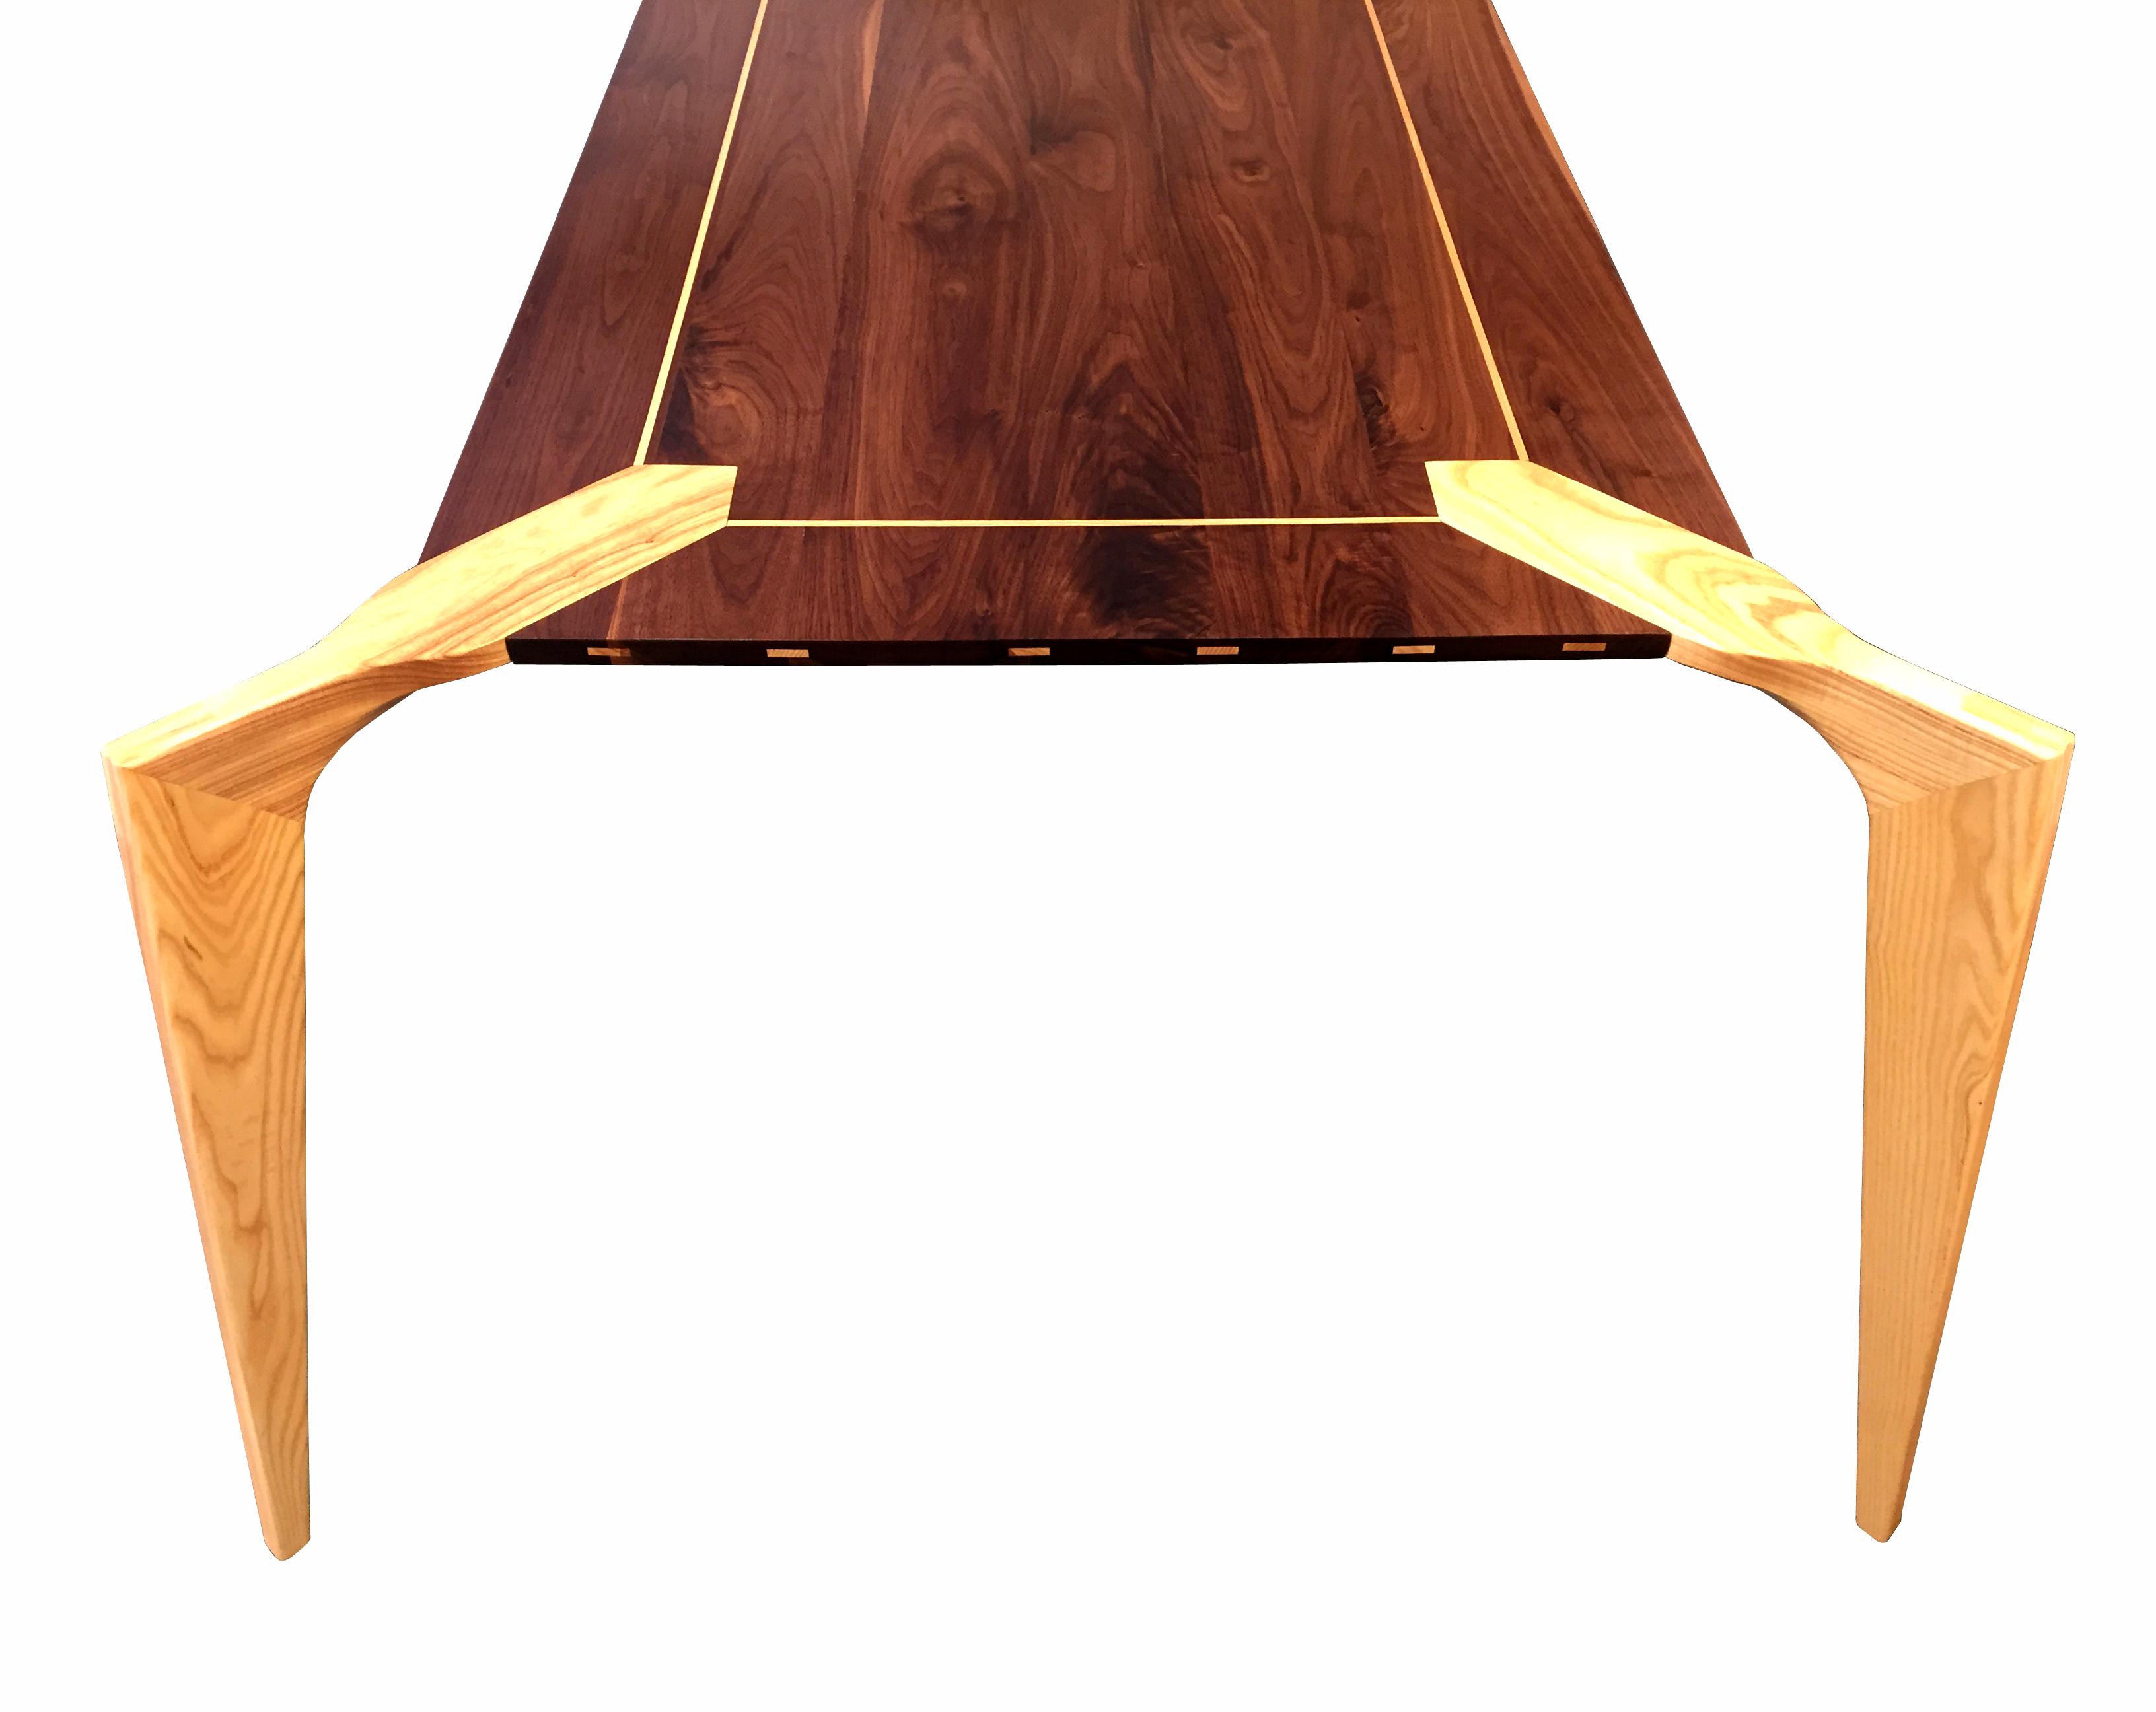 Joint Effort Studio Beeple Table Short SideView_F.jpg